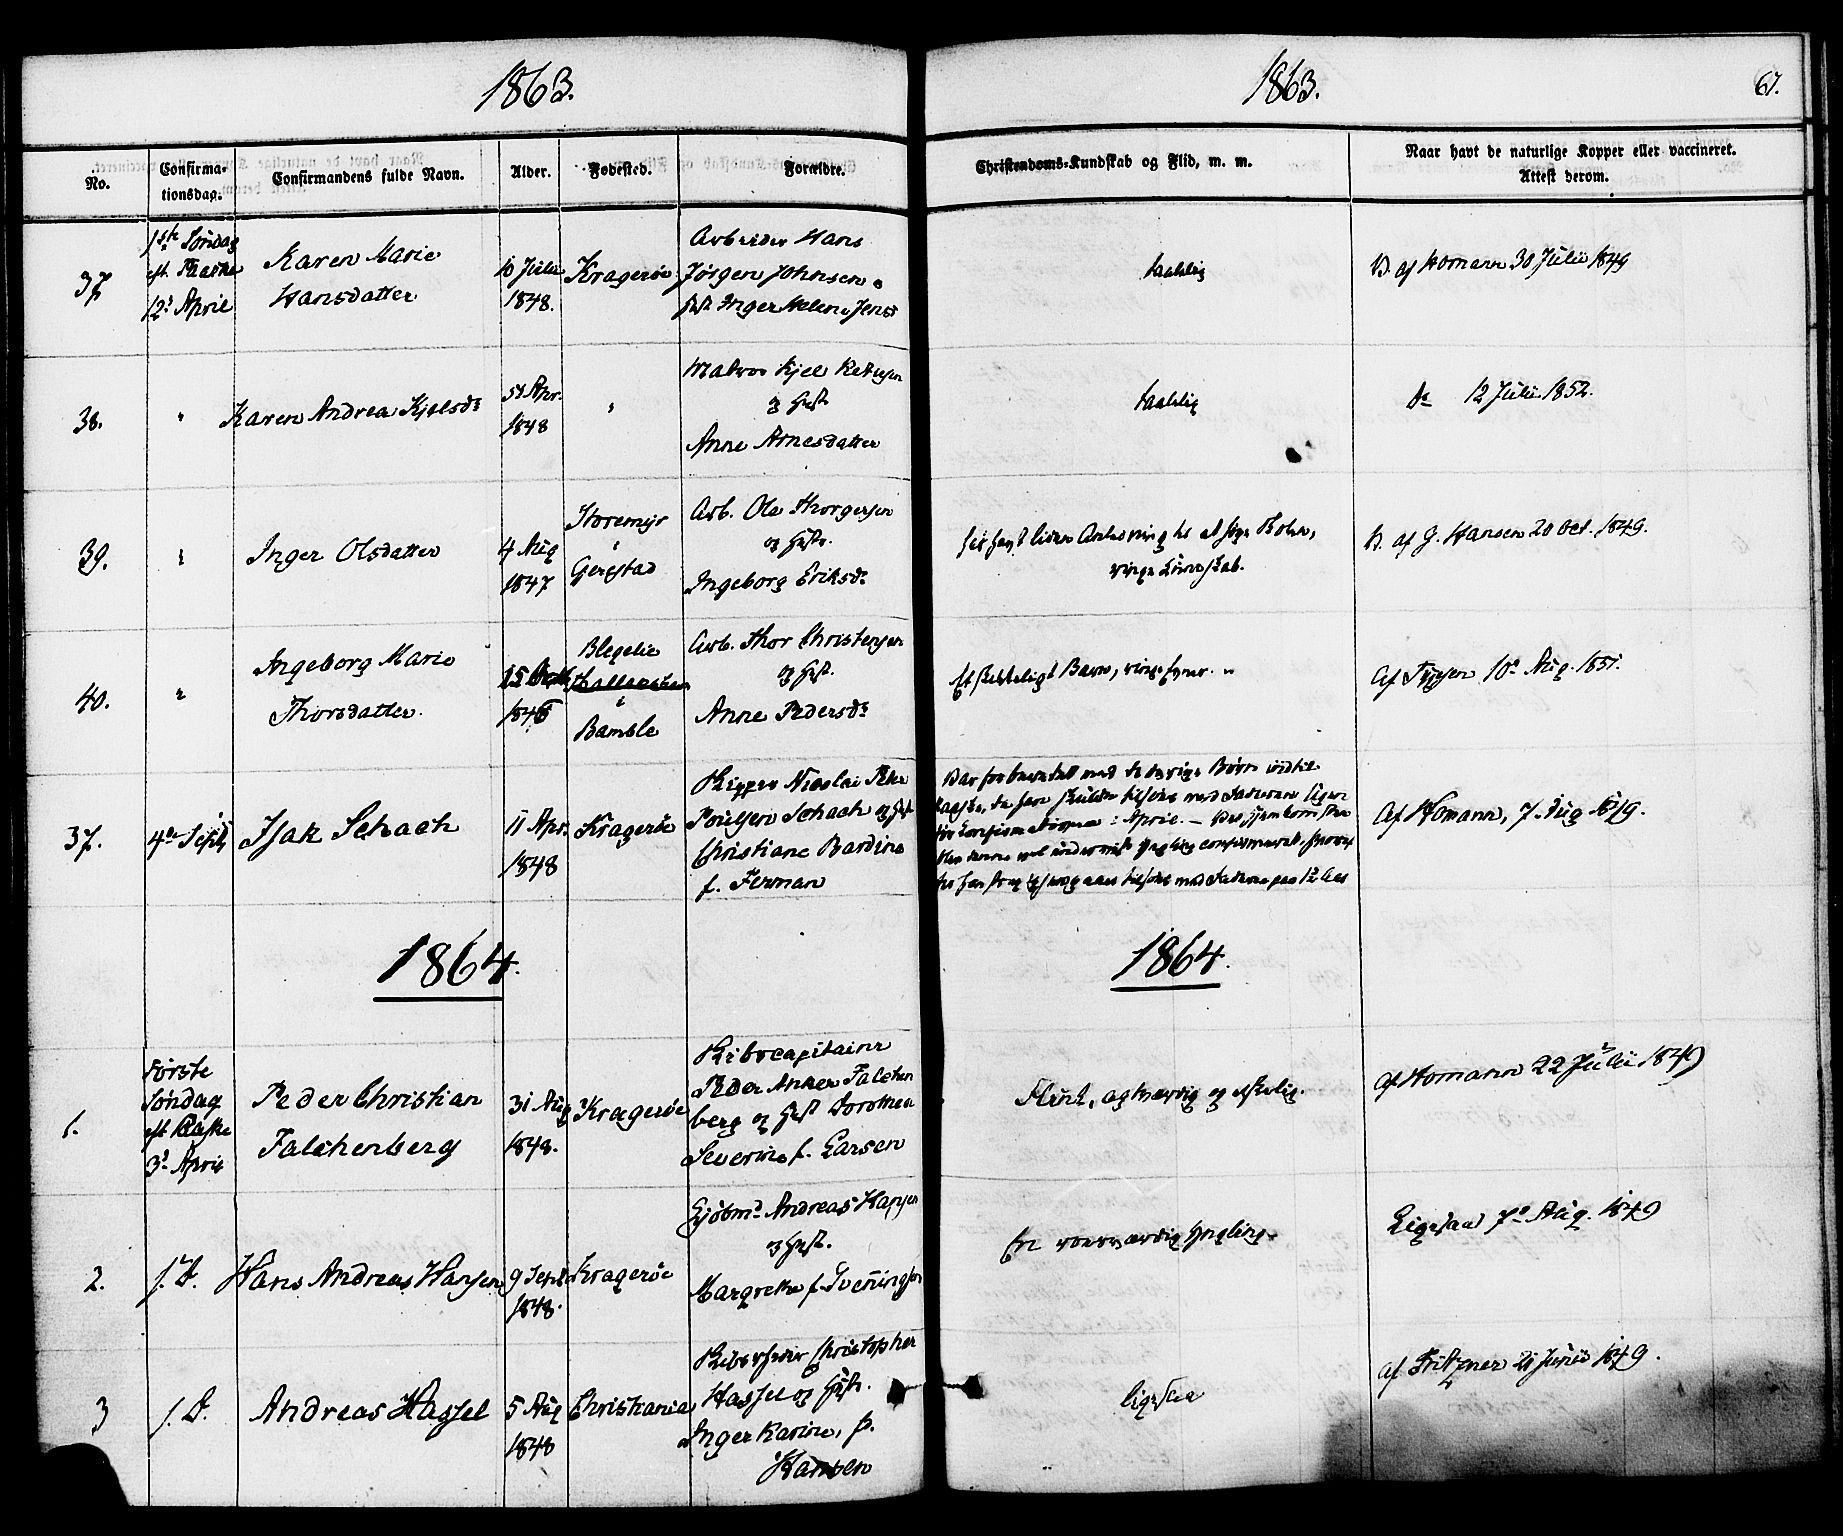 SAKO, Kragerø kirkebøker, F/Fa/L0008: Ministerialbok nr. 8, 1856-1880, s. 67